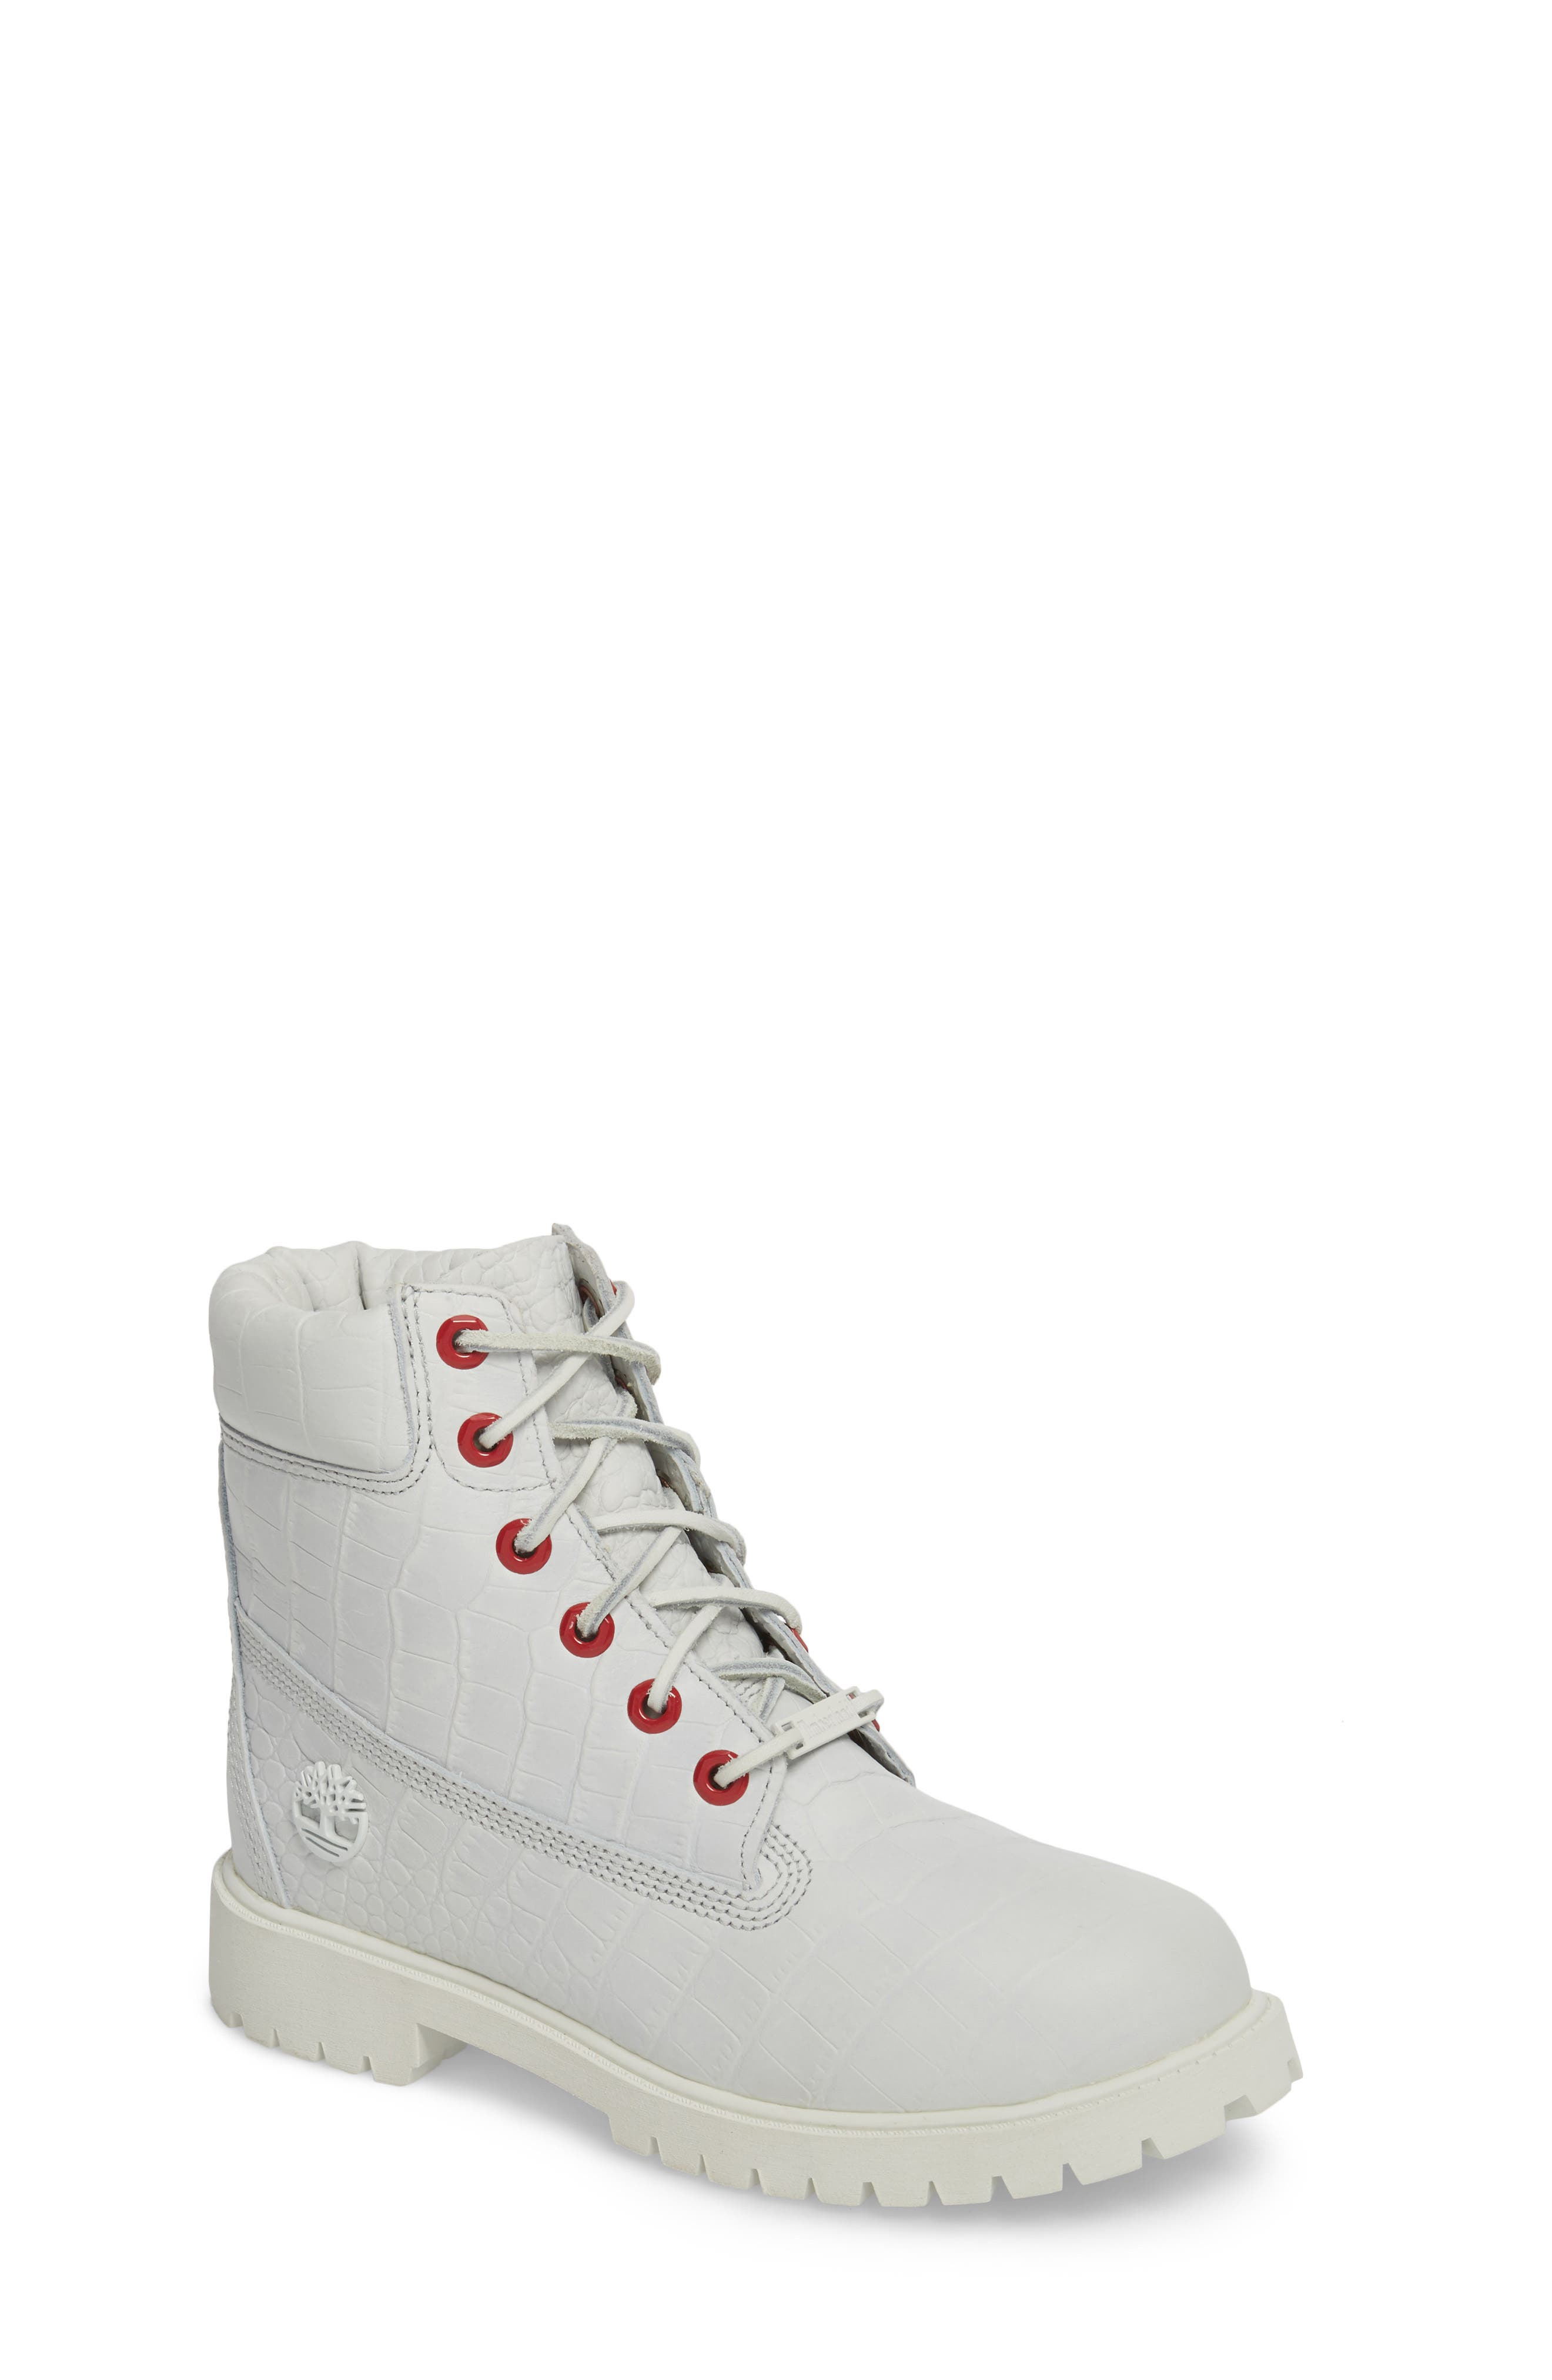 6-Inch Premium Waterproof Boot,                             Main thumbnail 1, color,                             White Cardinal Exotic